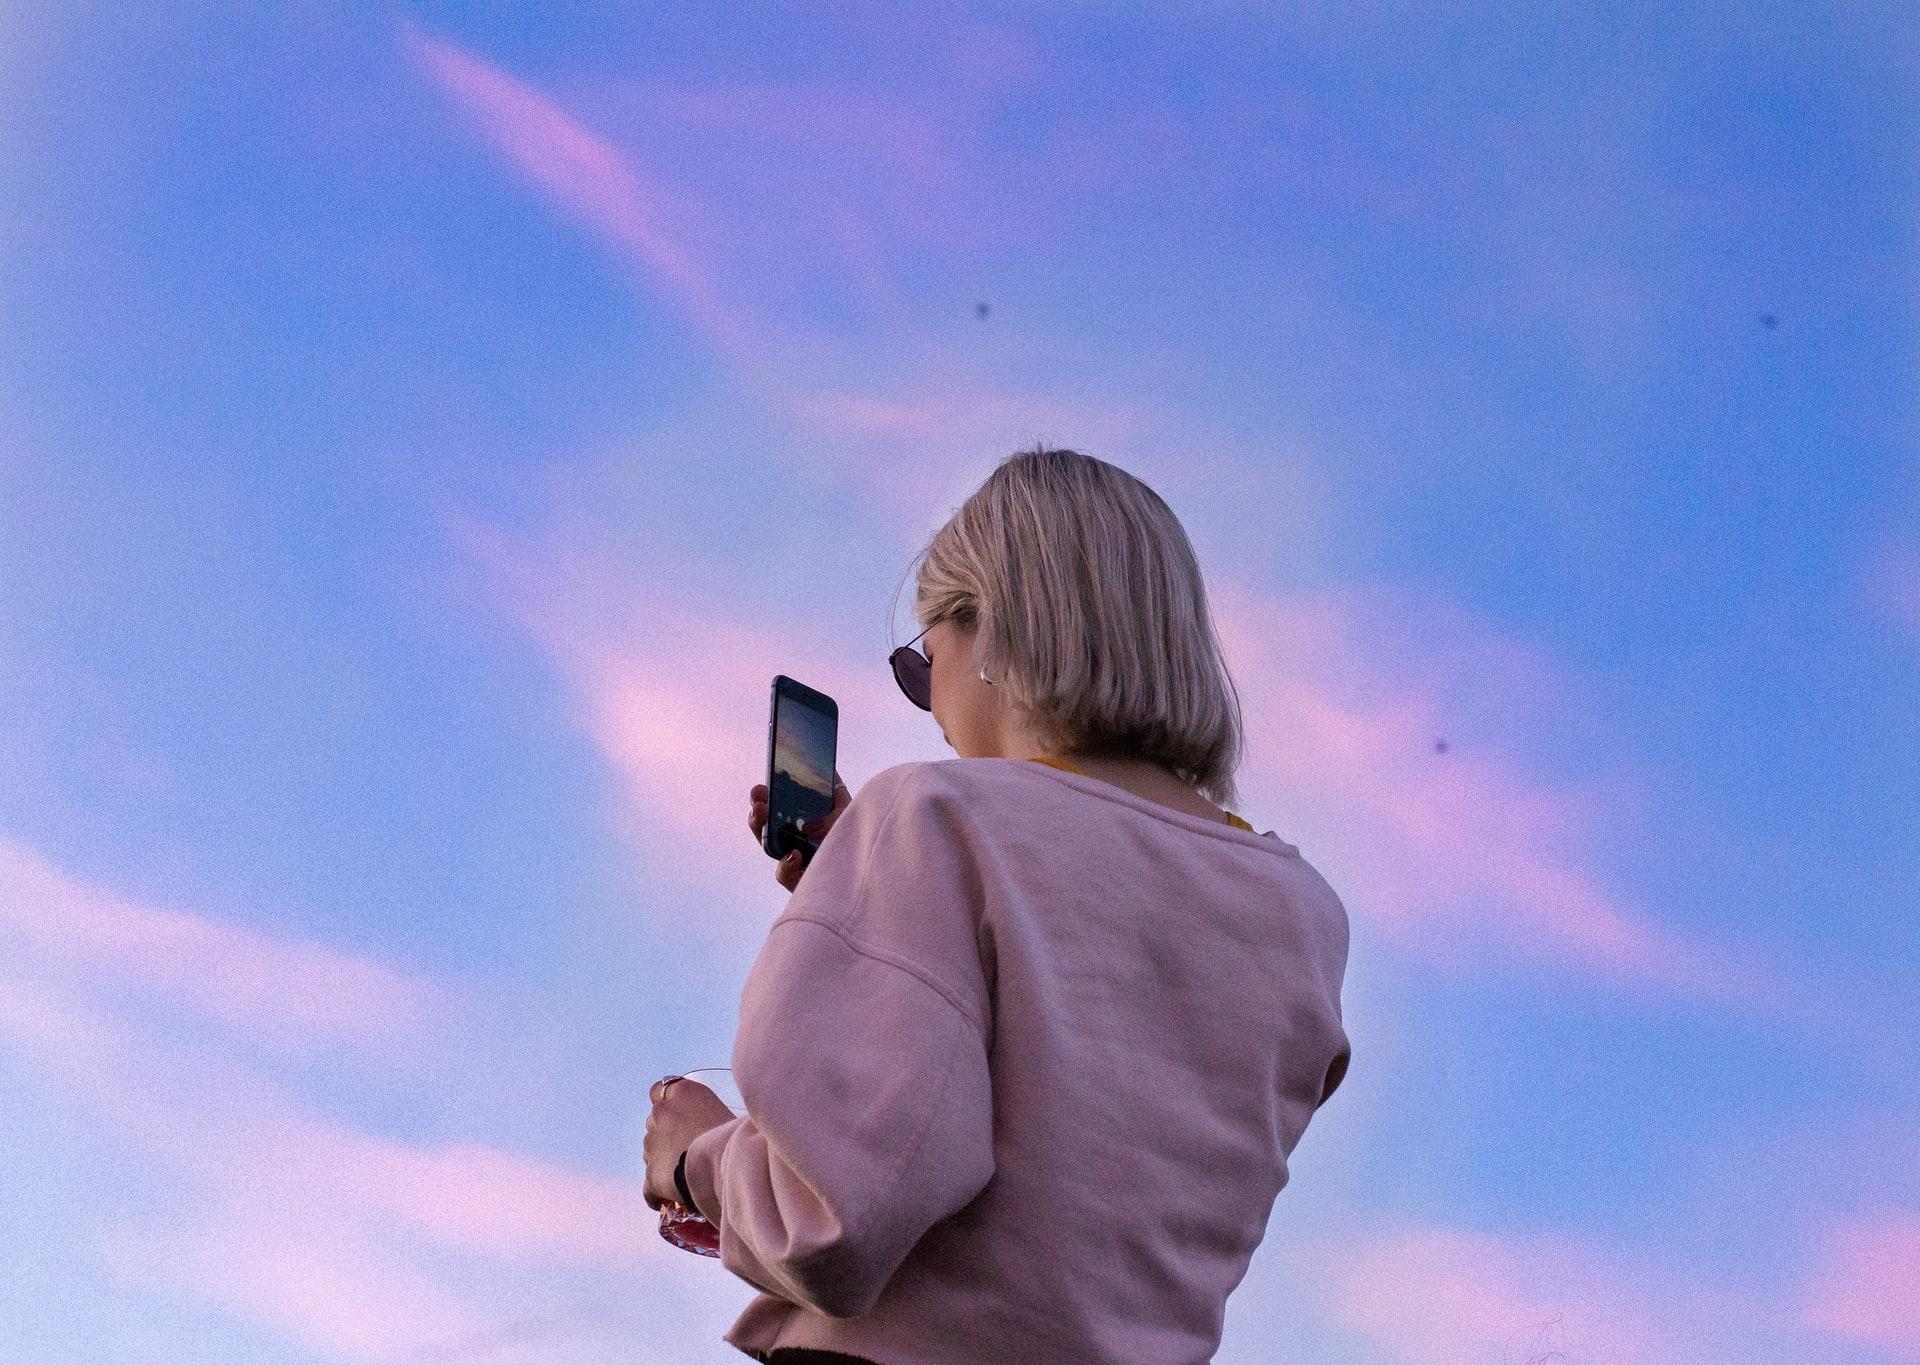 Attachment Theory + Digital Behavior